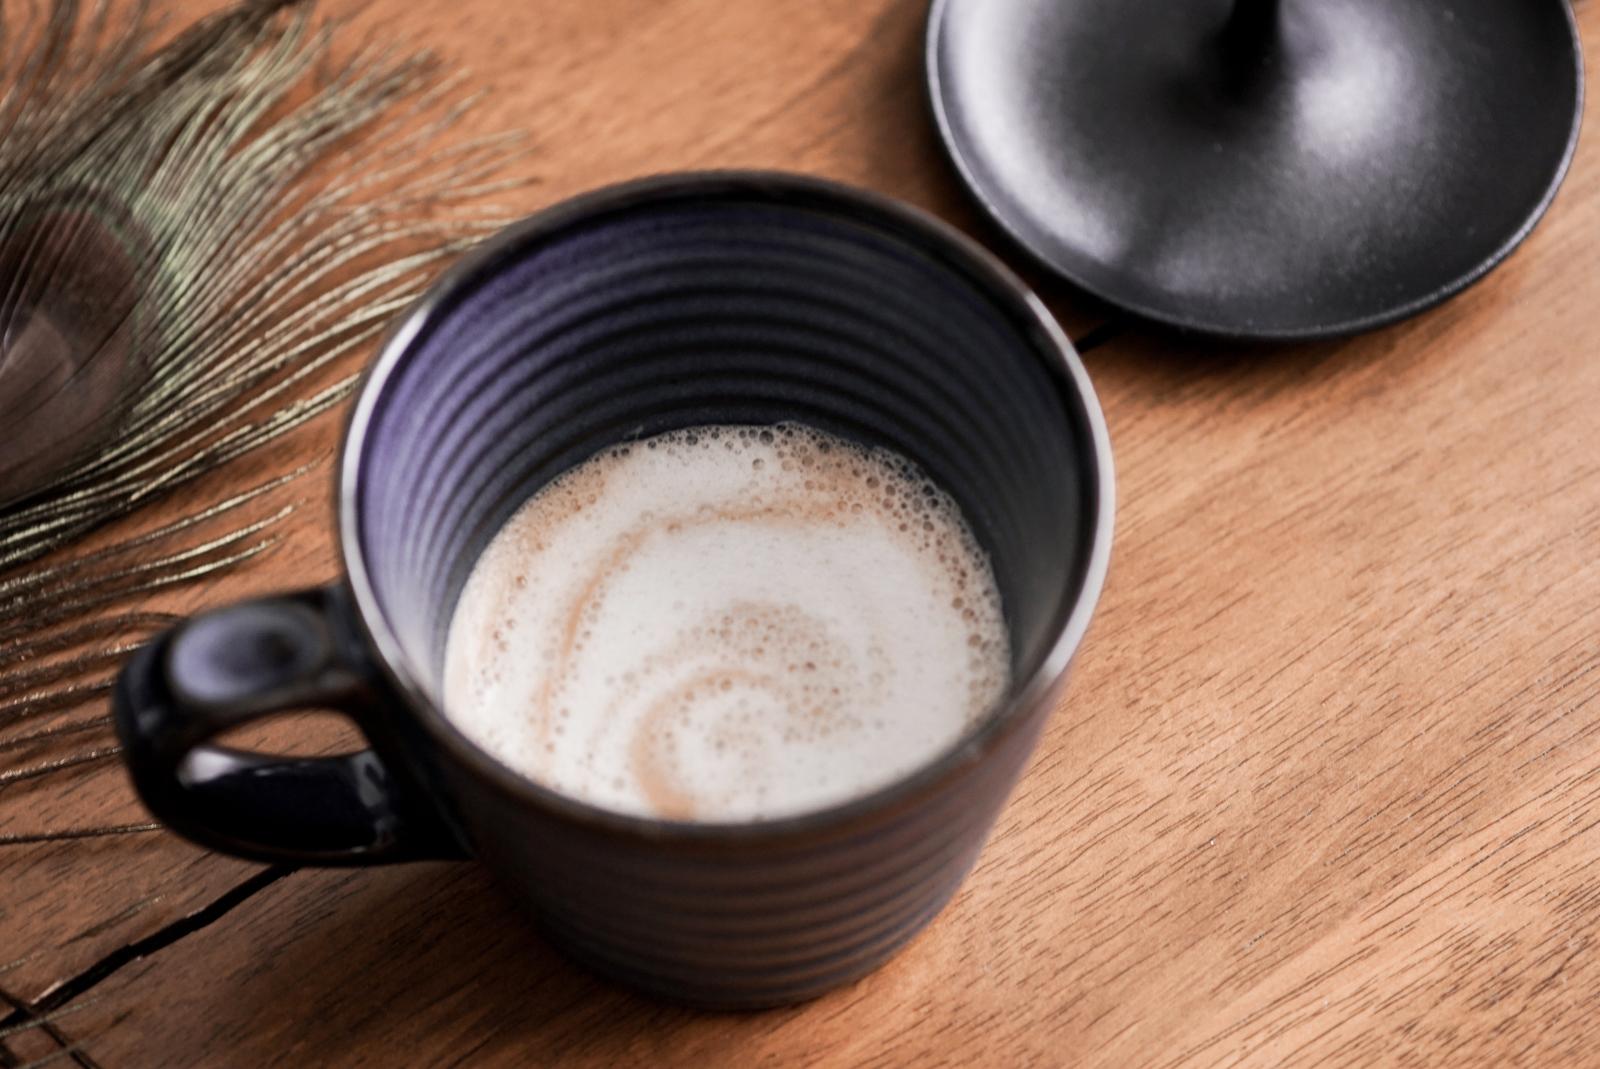 DeLonghi All in One latte